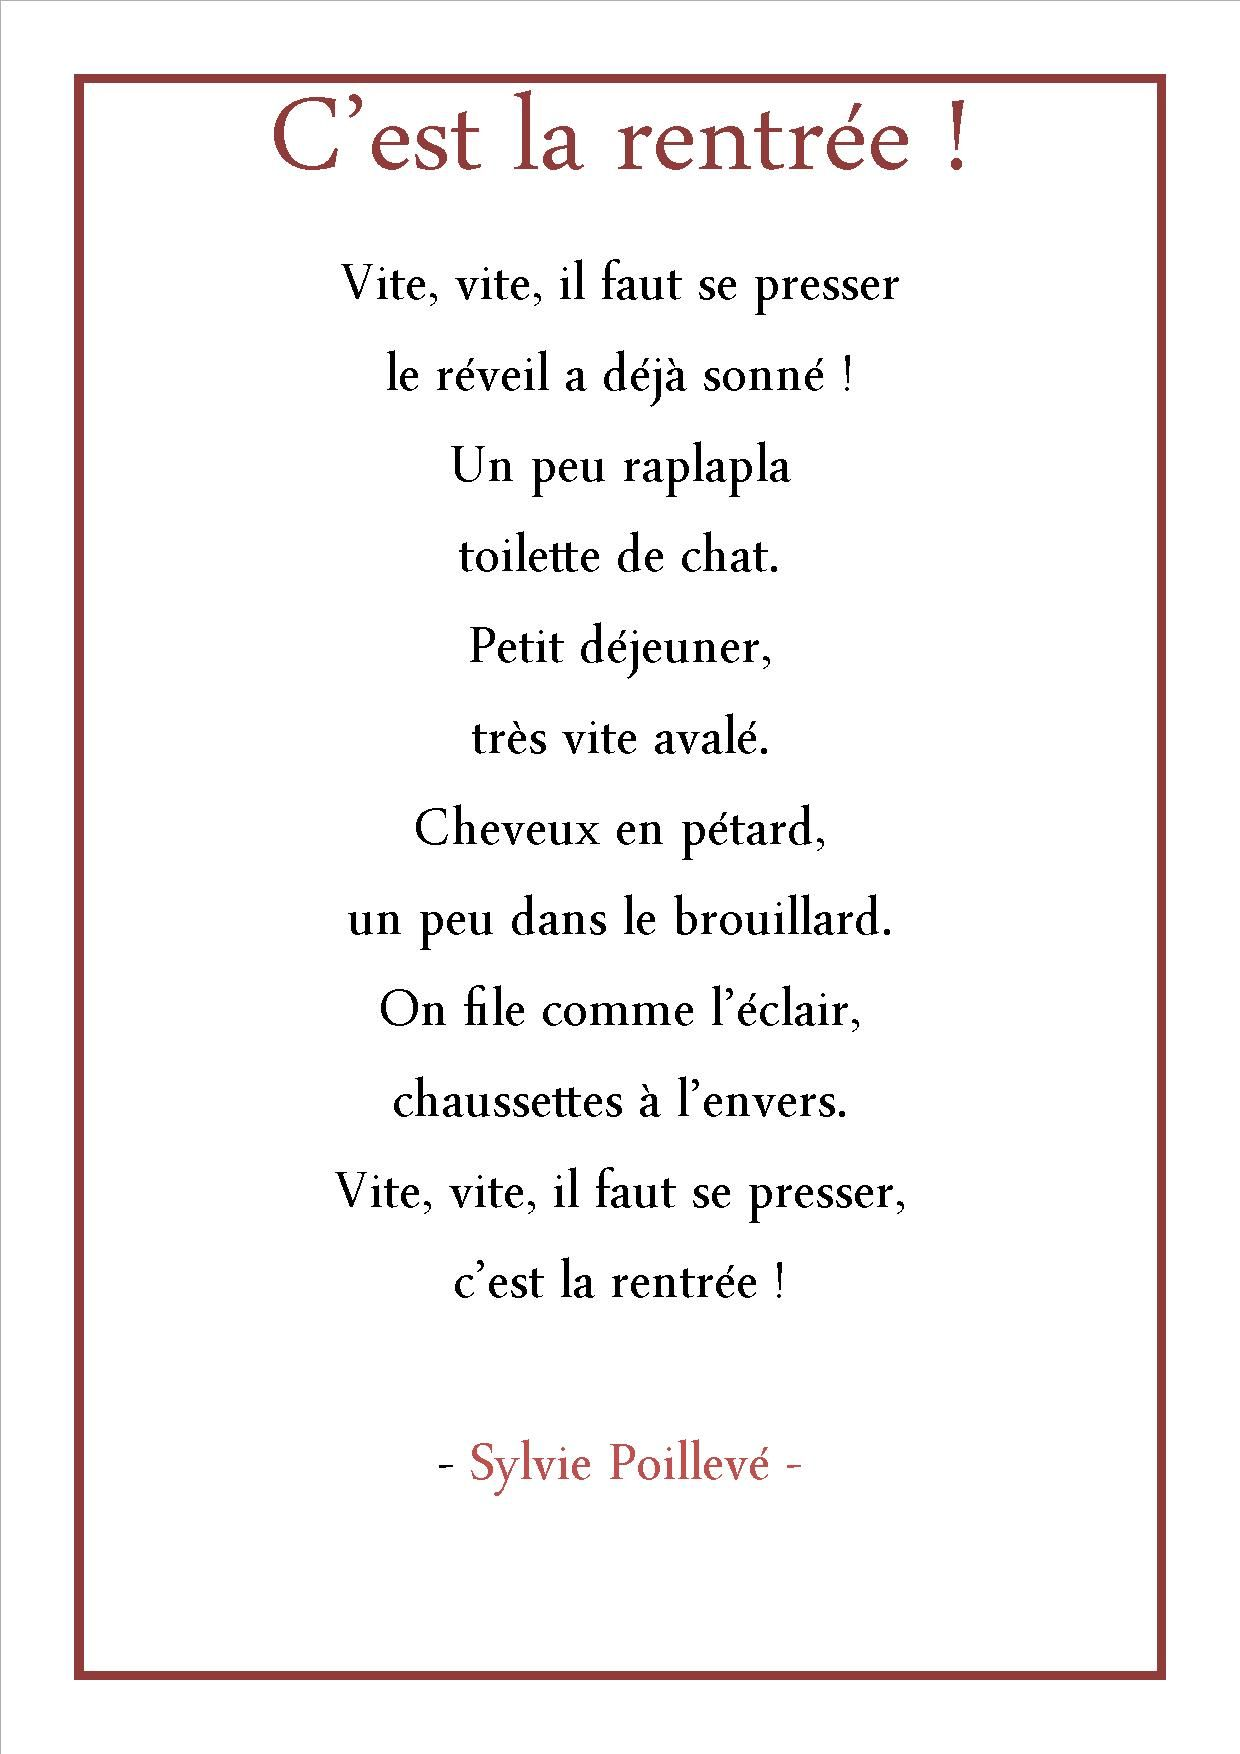 poesie c'est la rentree sylvie